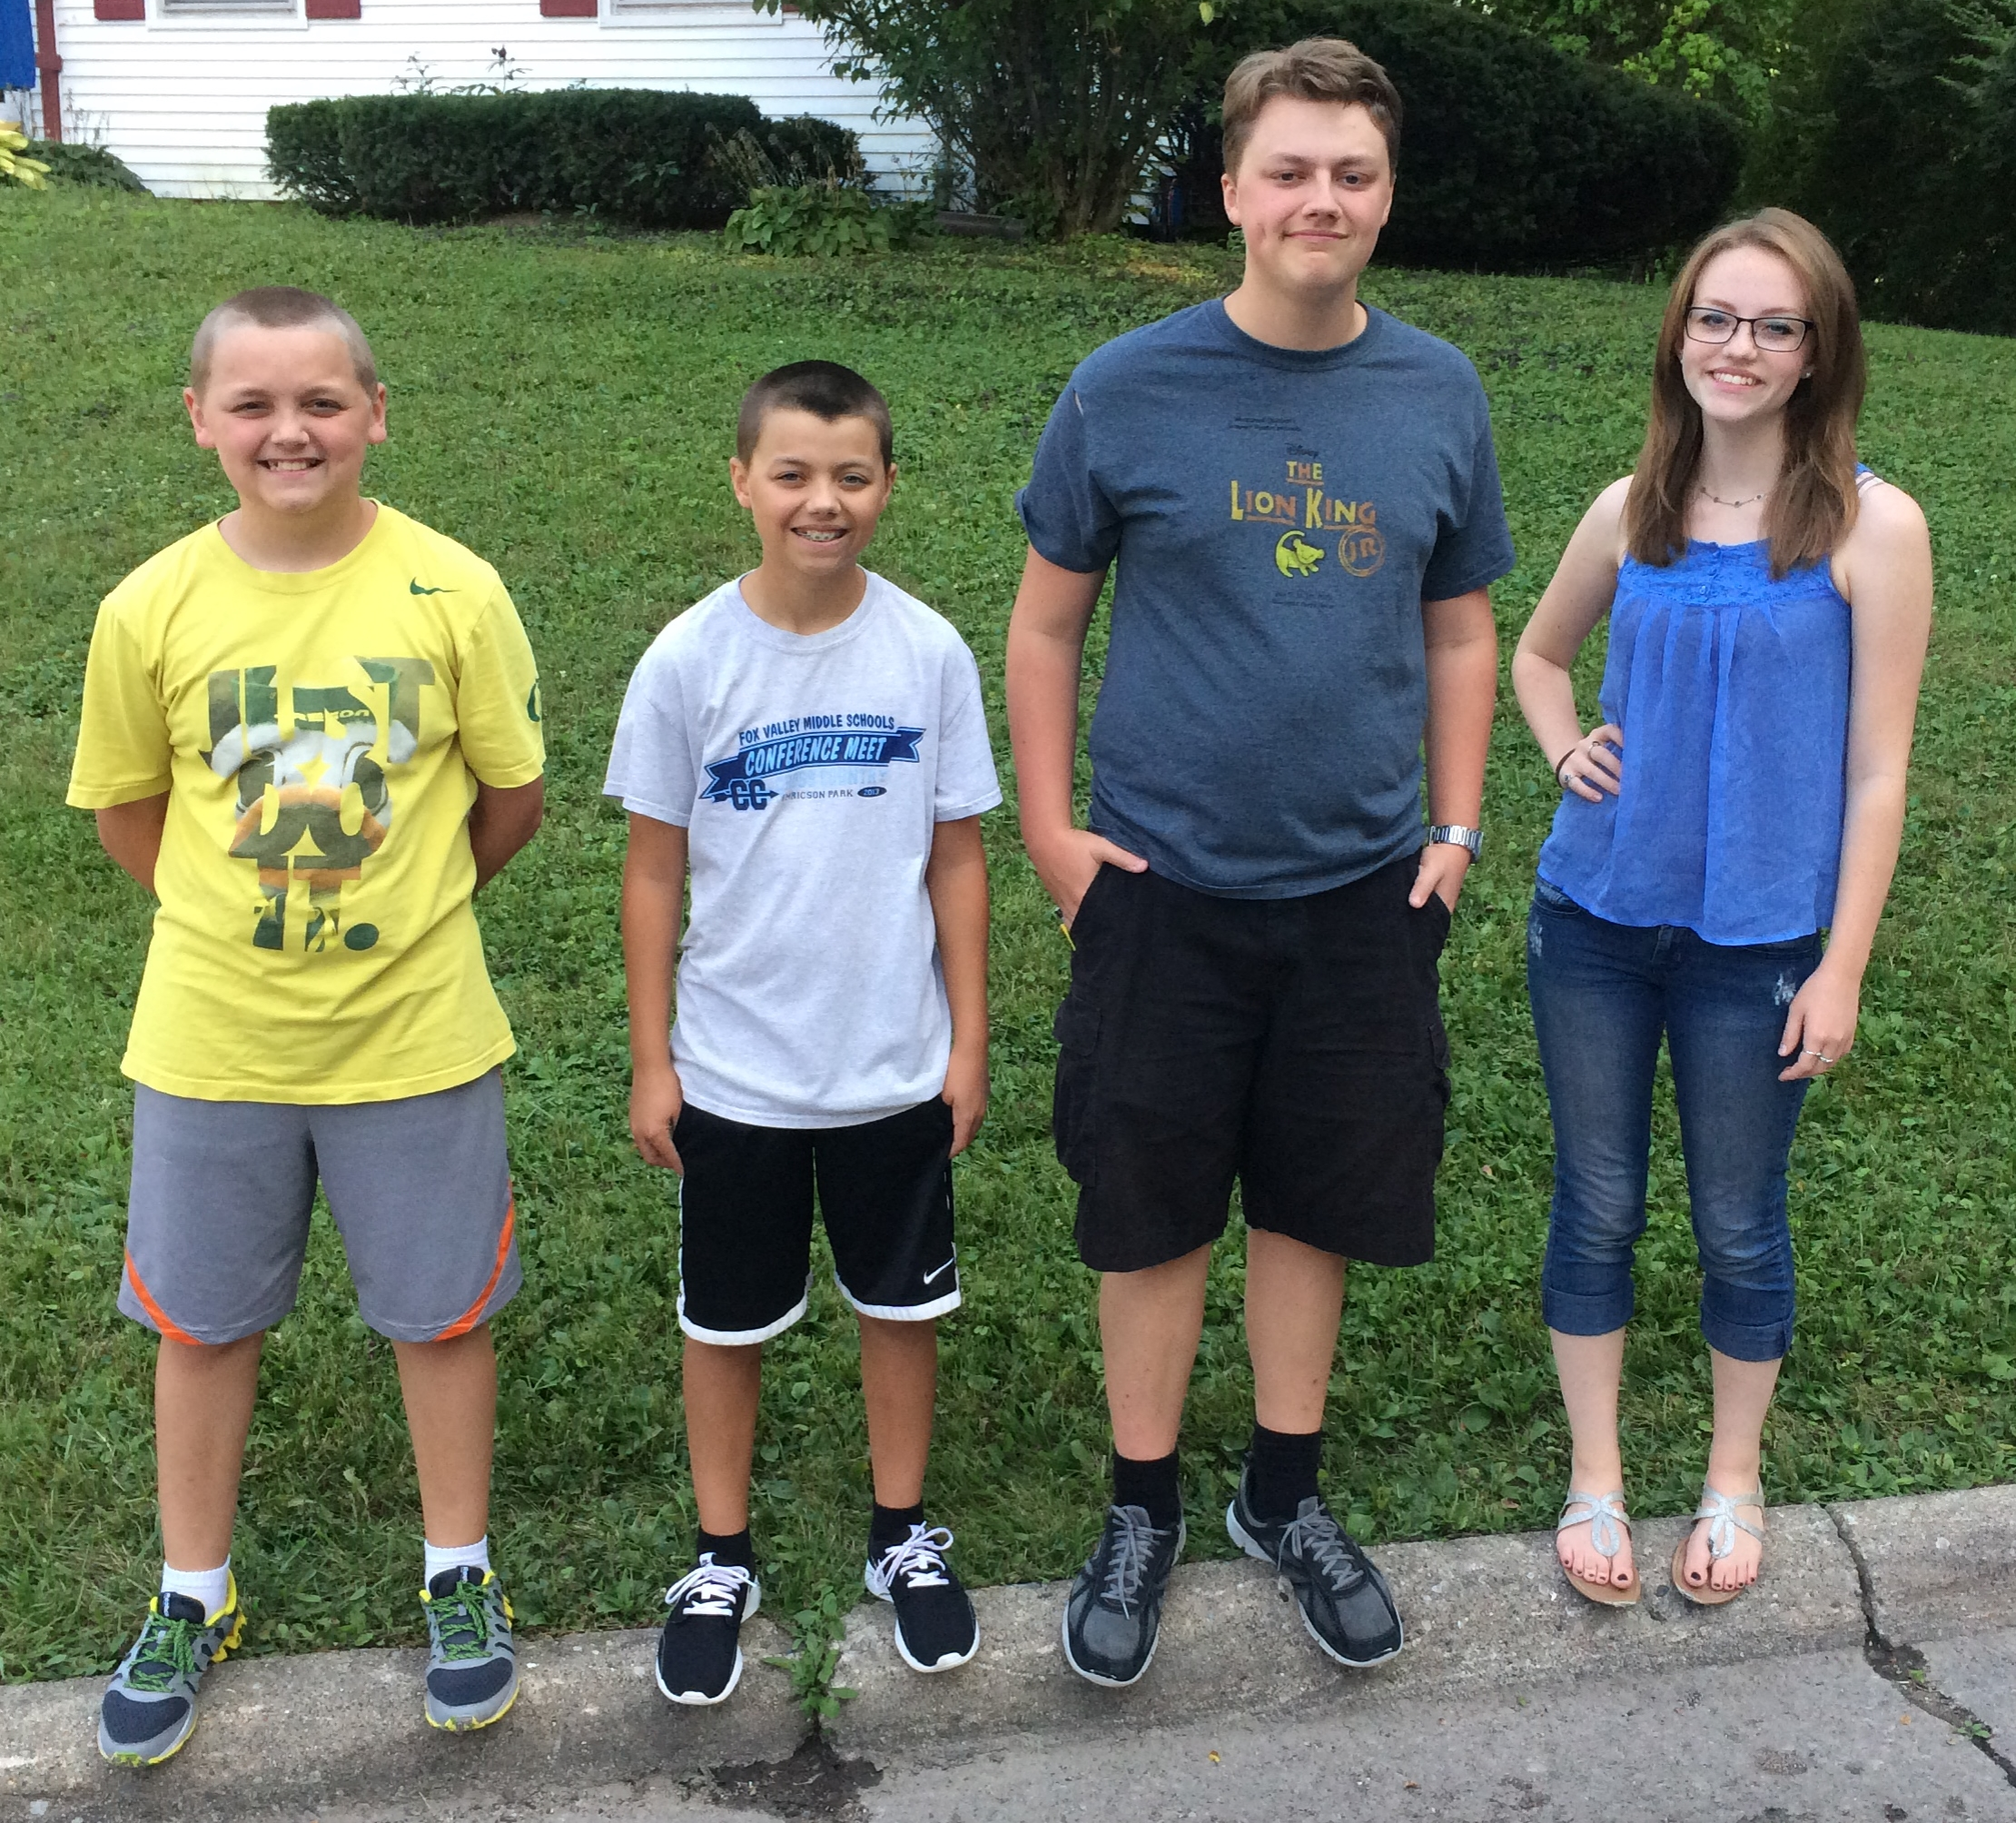 2015 - Daniel (12, 7th grade), Elijah (14, Freshman), Jack (16, Junior), Sarah (18, College Freshman)